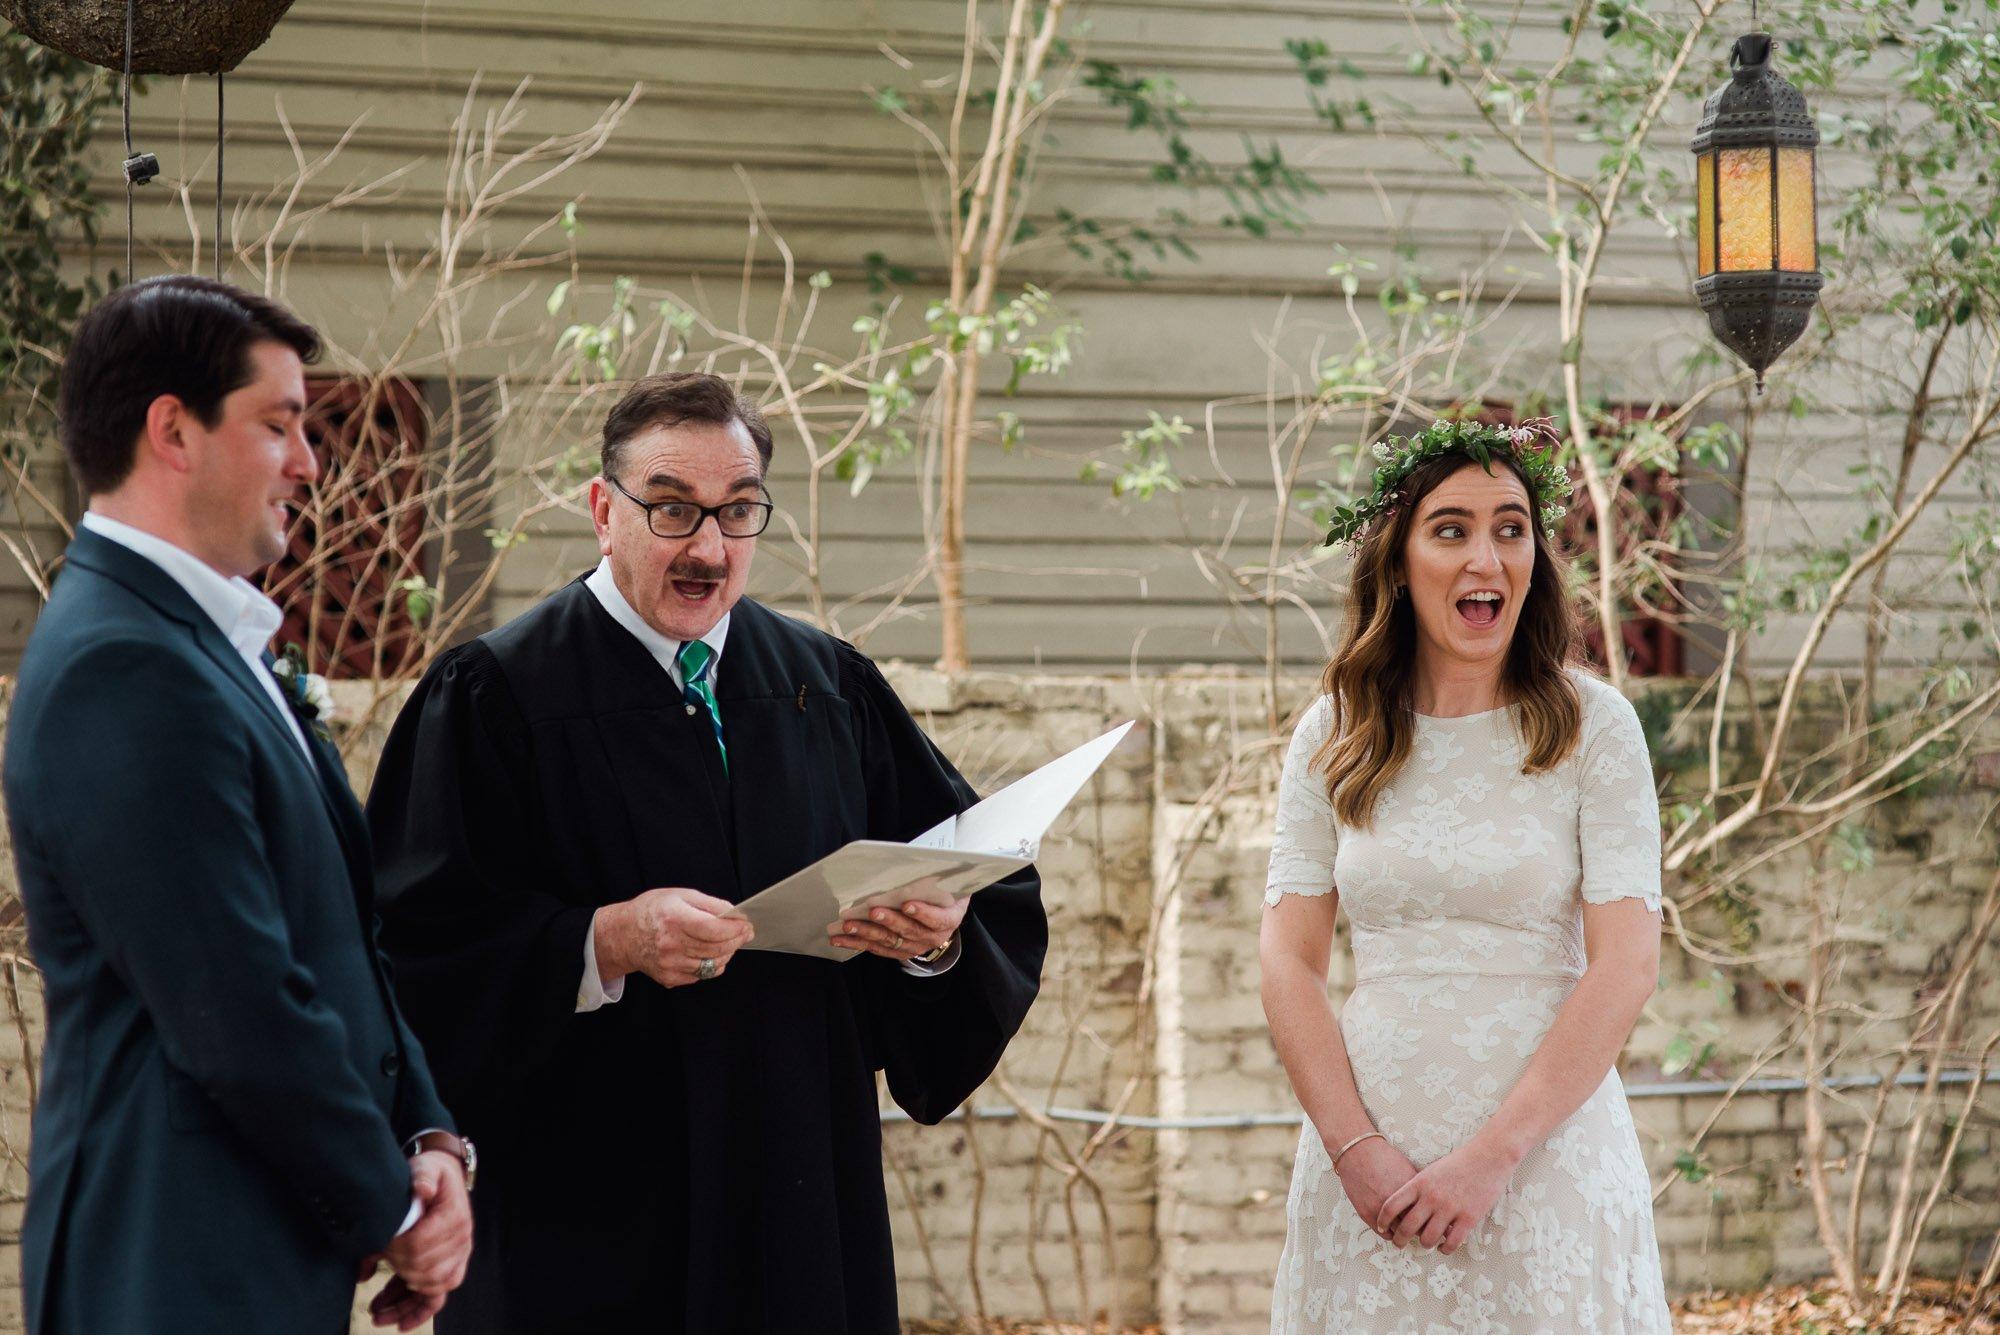 organic, warm wedding photography for creative couples in san antonio, texas